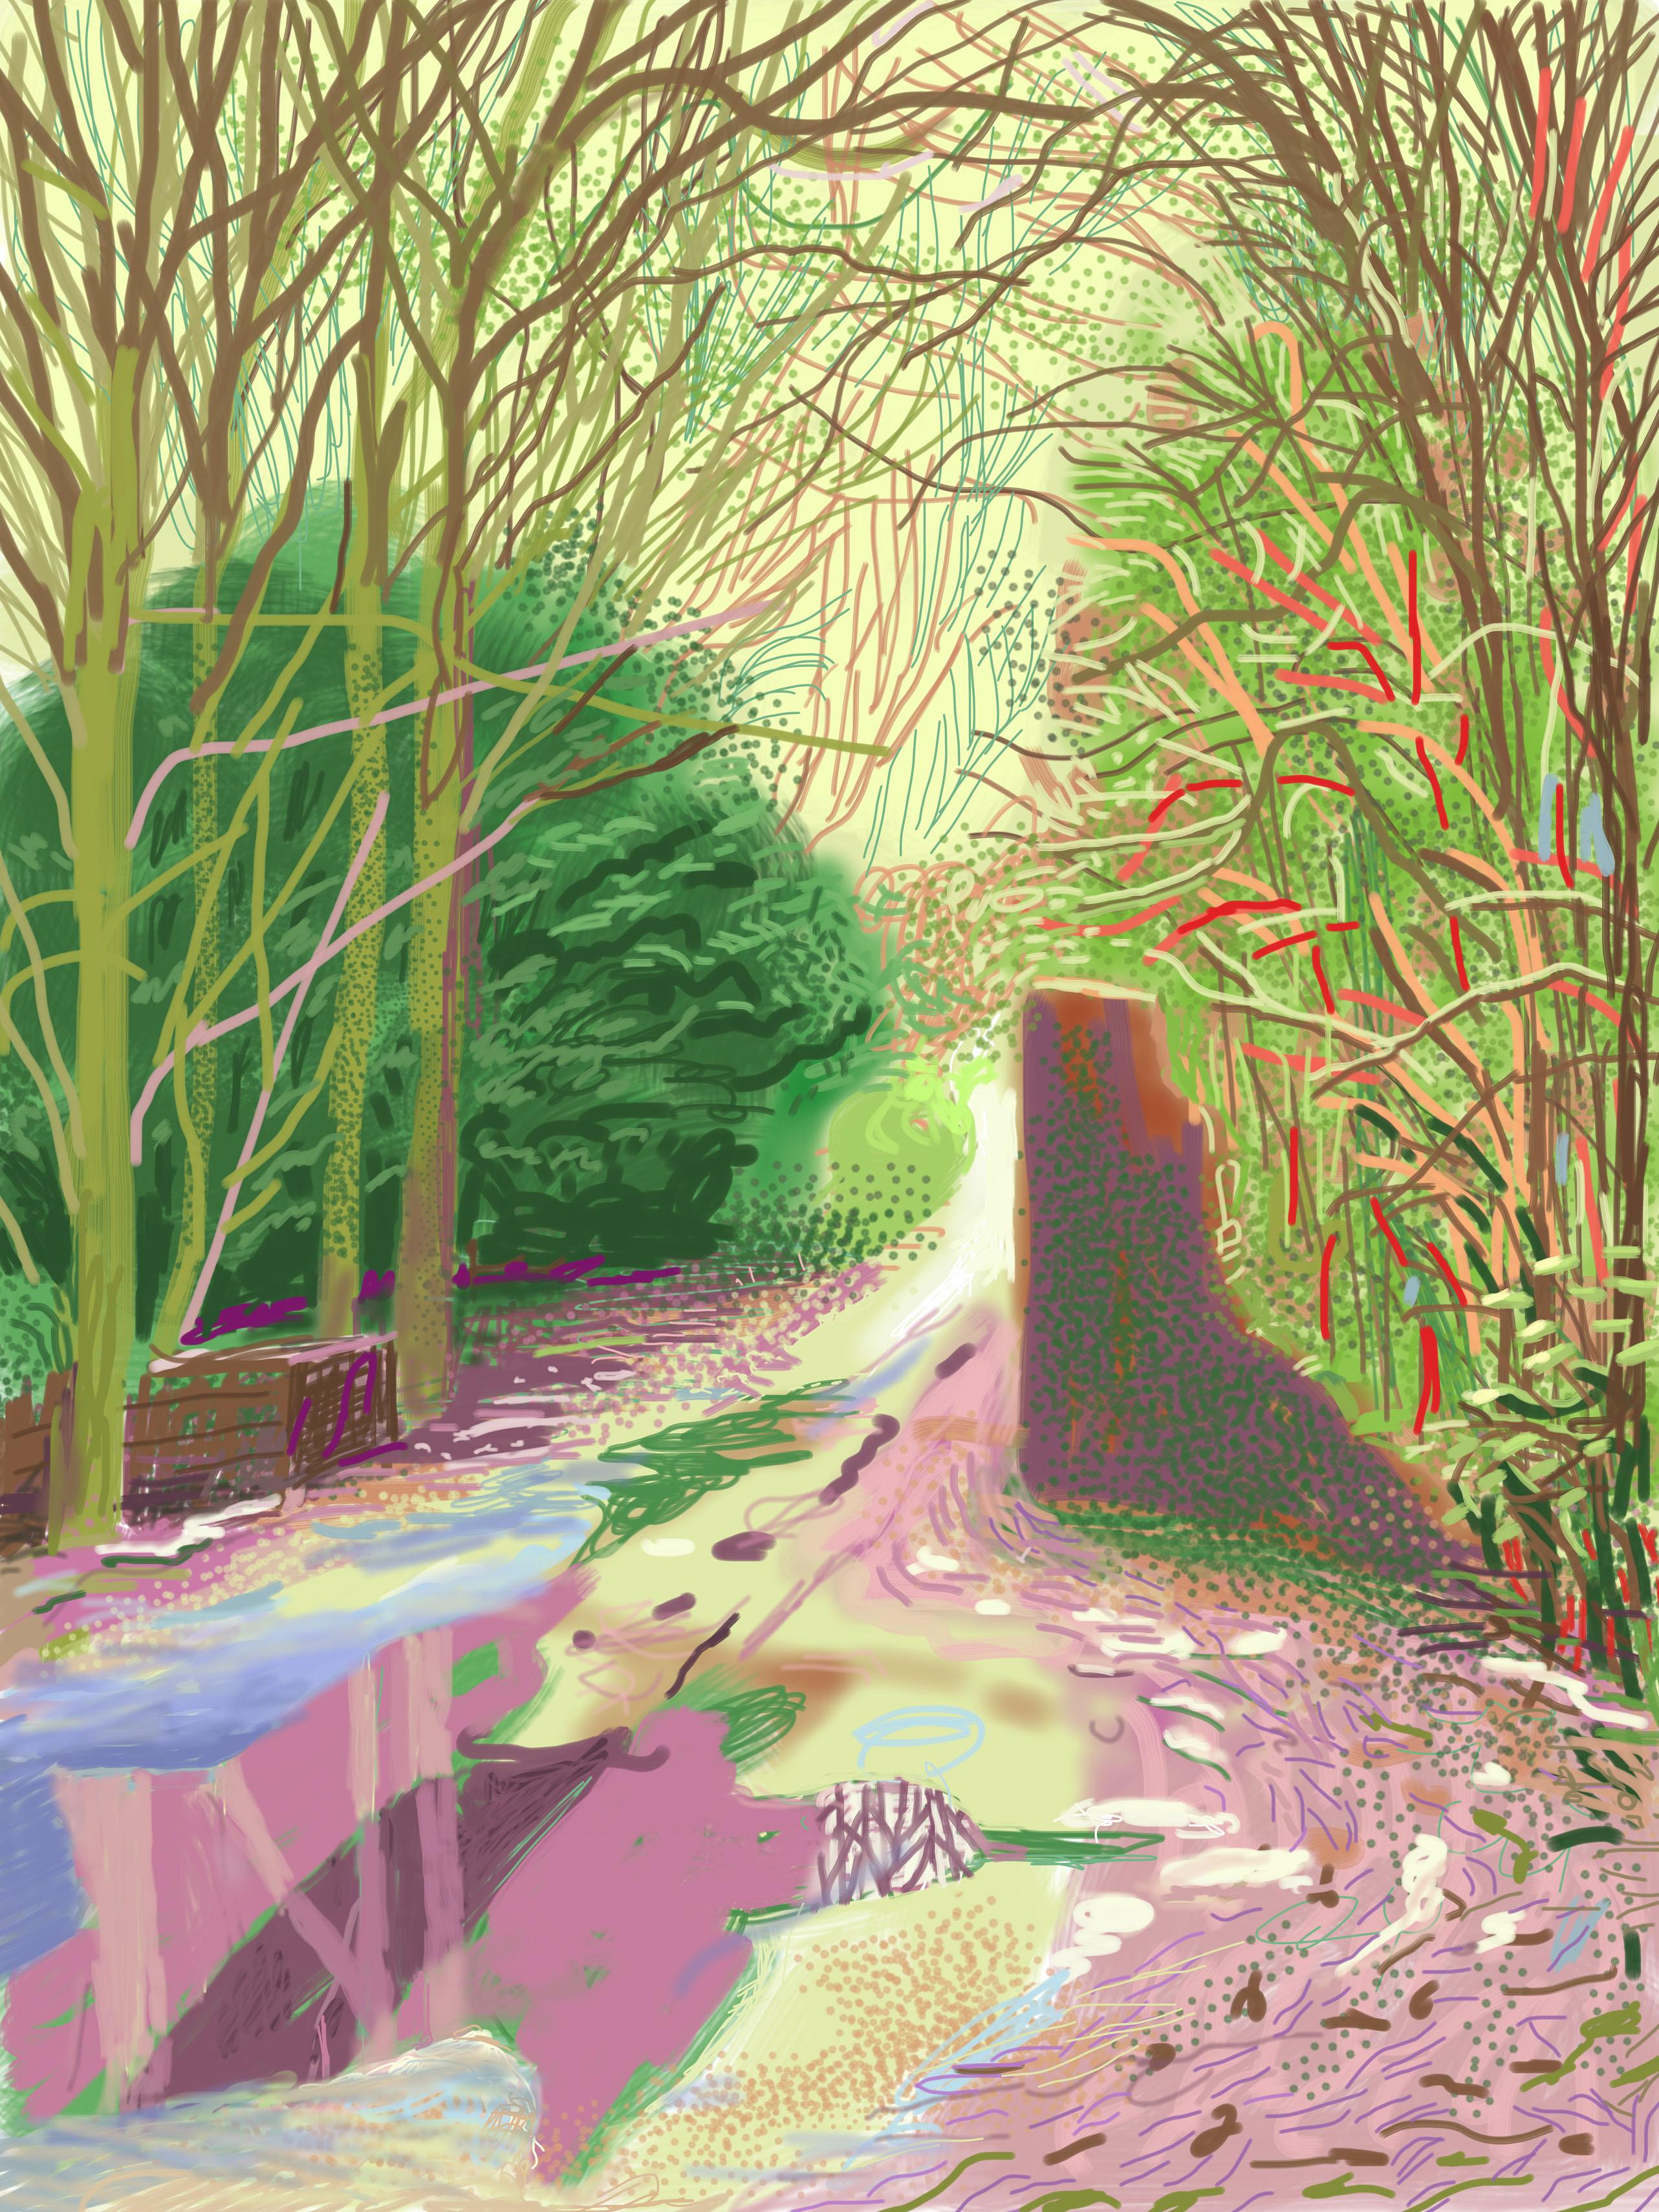 A question on David Hockney?